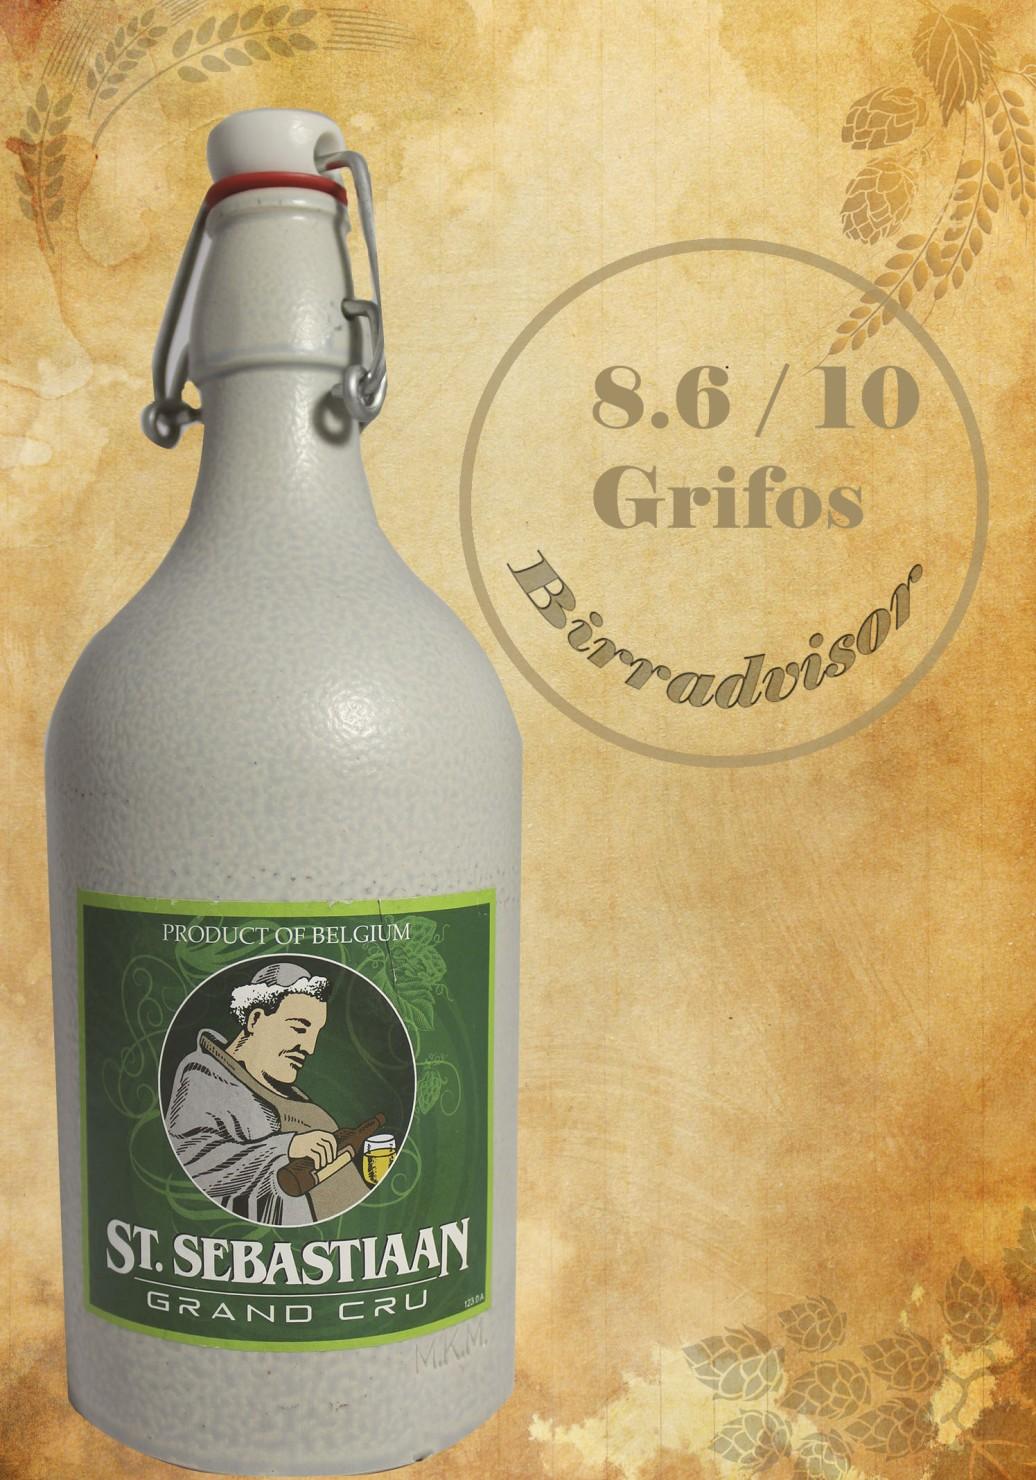 ST. Sebastiaan (Grand Cru)